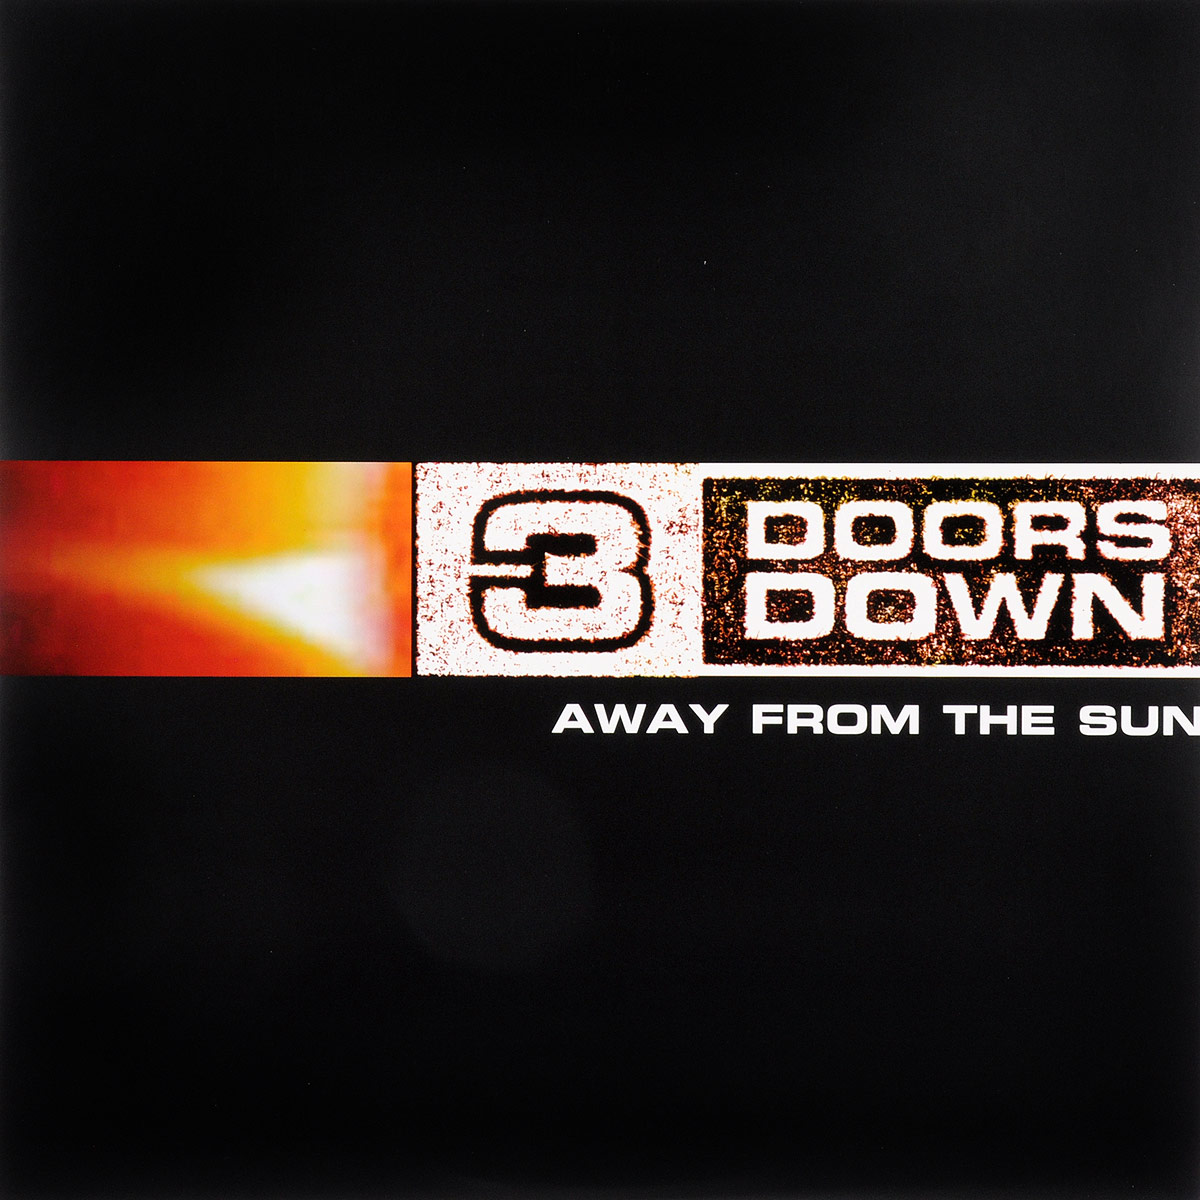 цена на 3 Doors Down 3 Doors Down. Away From The Sun (2 LP)